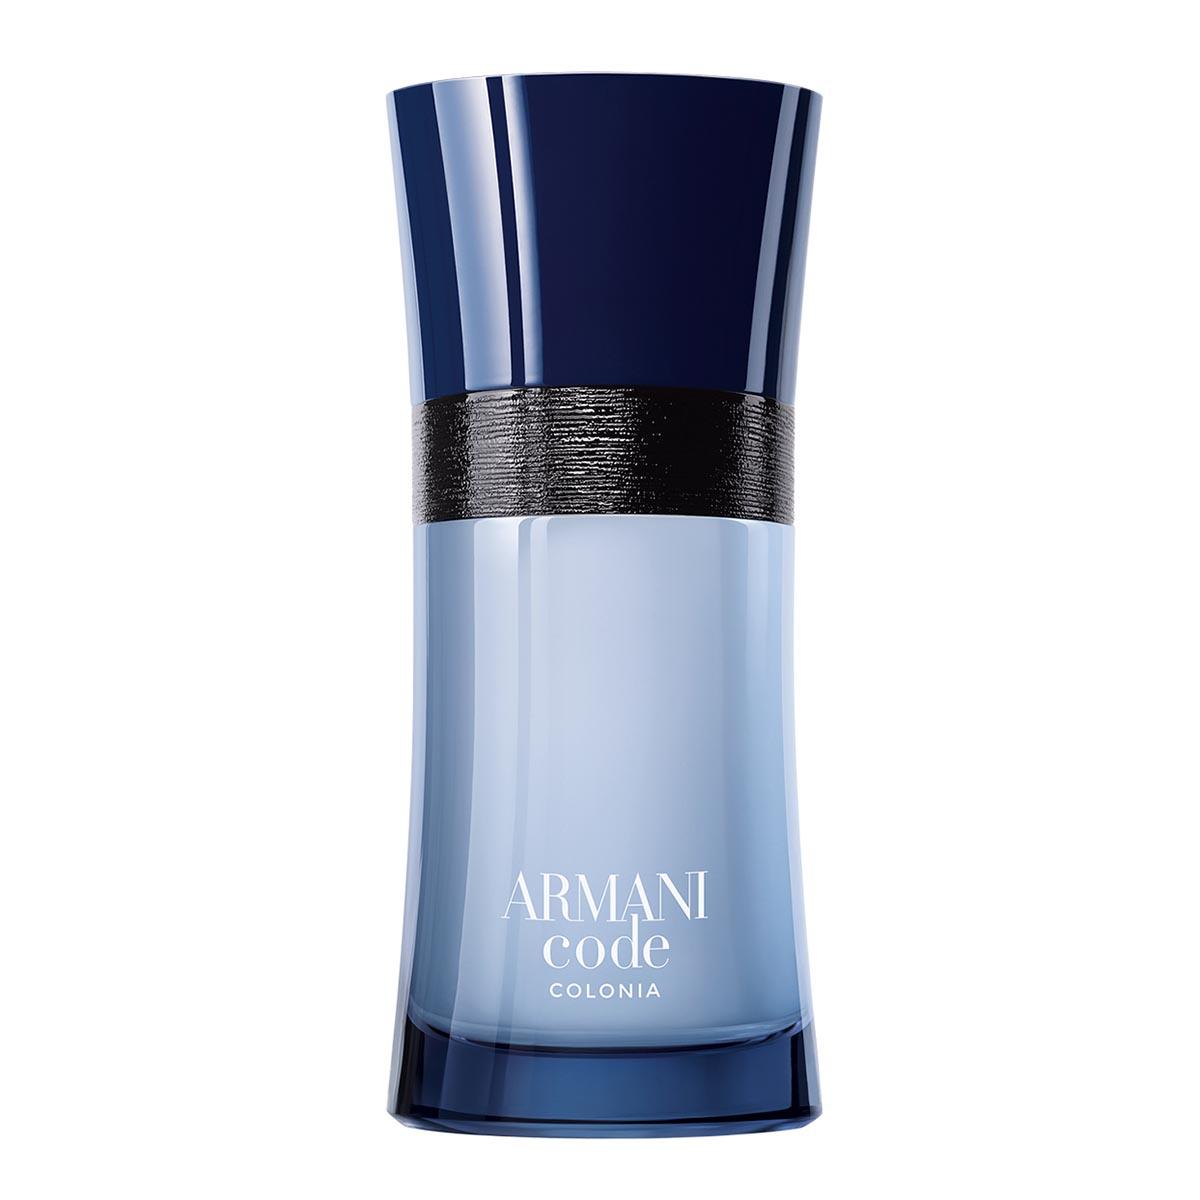 Giorgio armani code colonia eau de toilette 75ml vaporizador